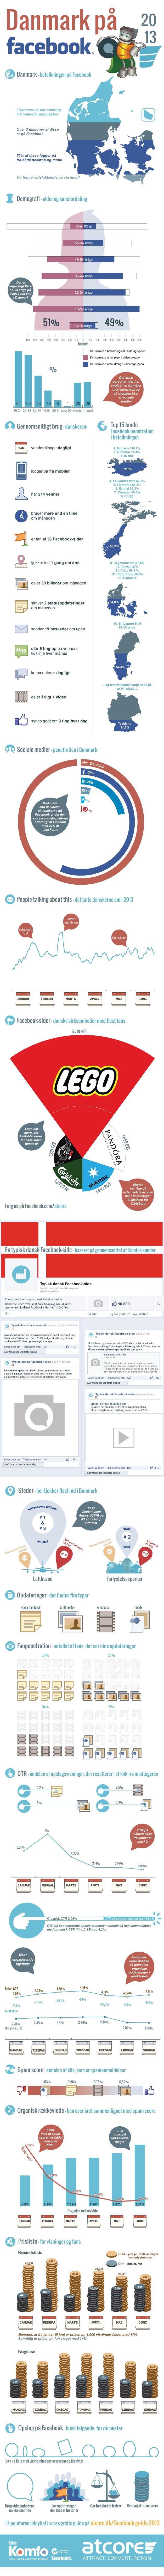 Danmark på Facebook 2013